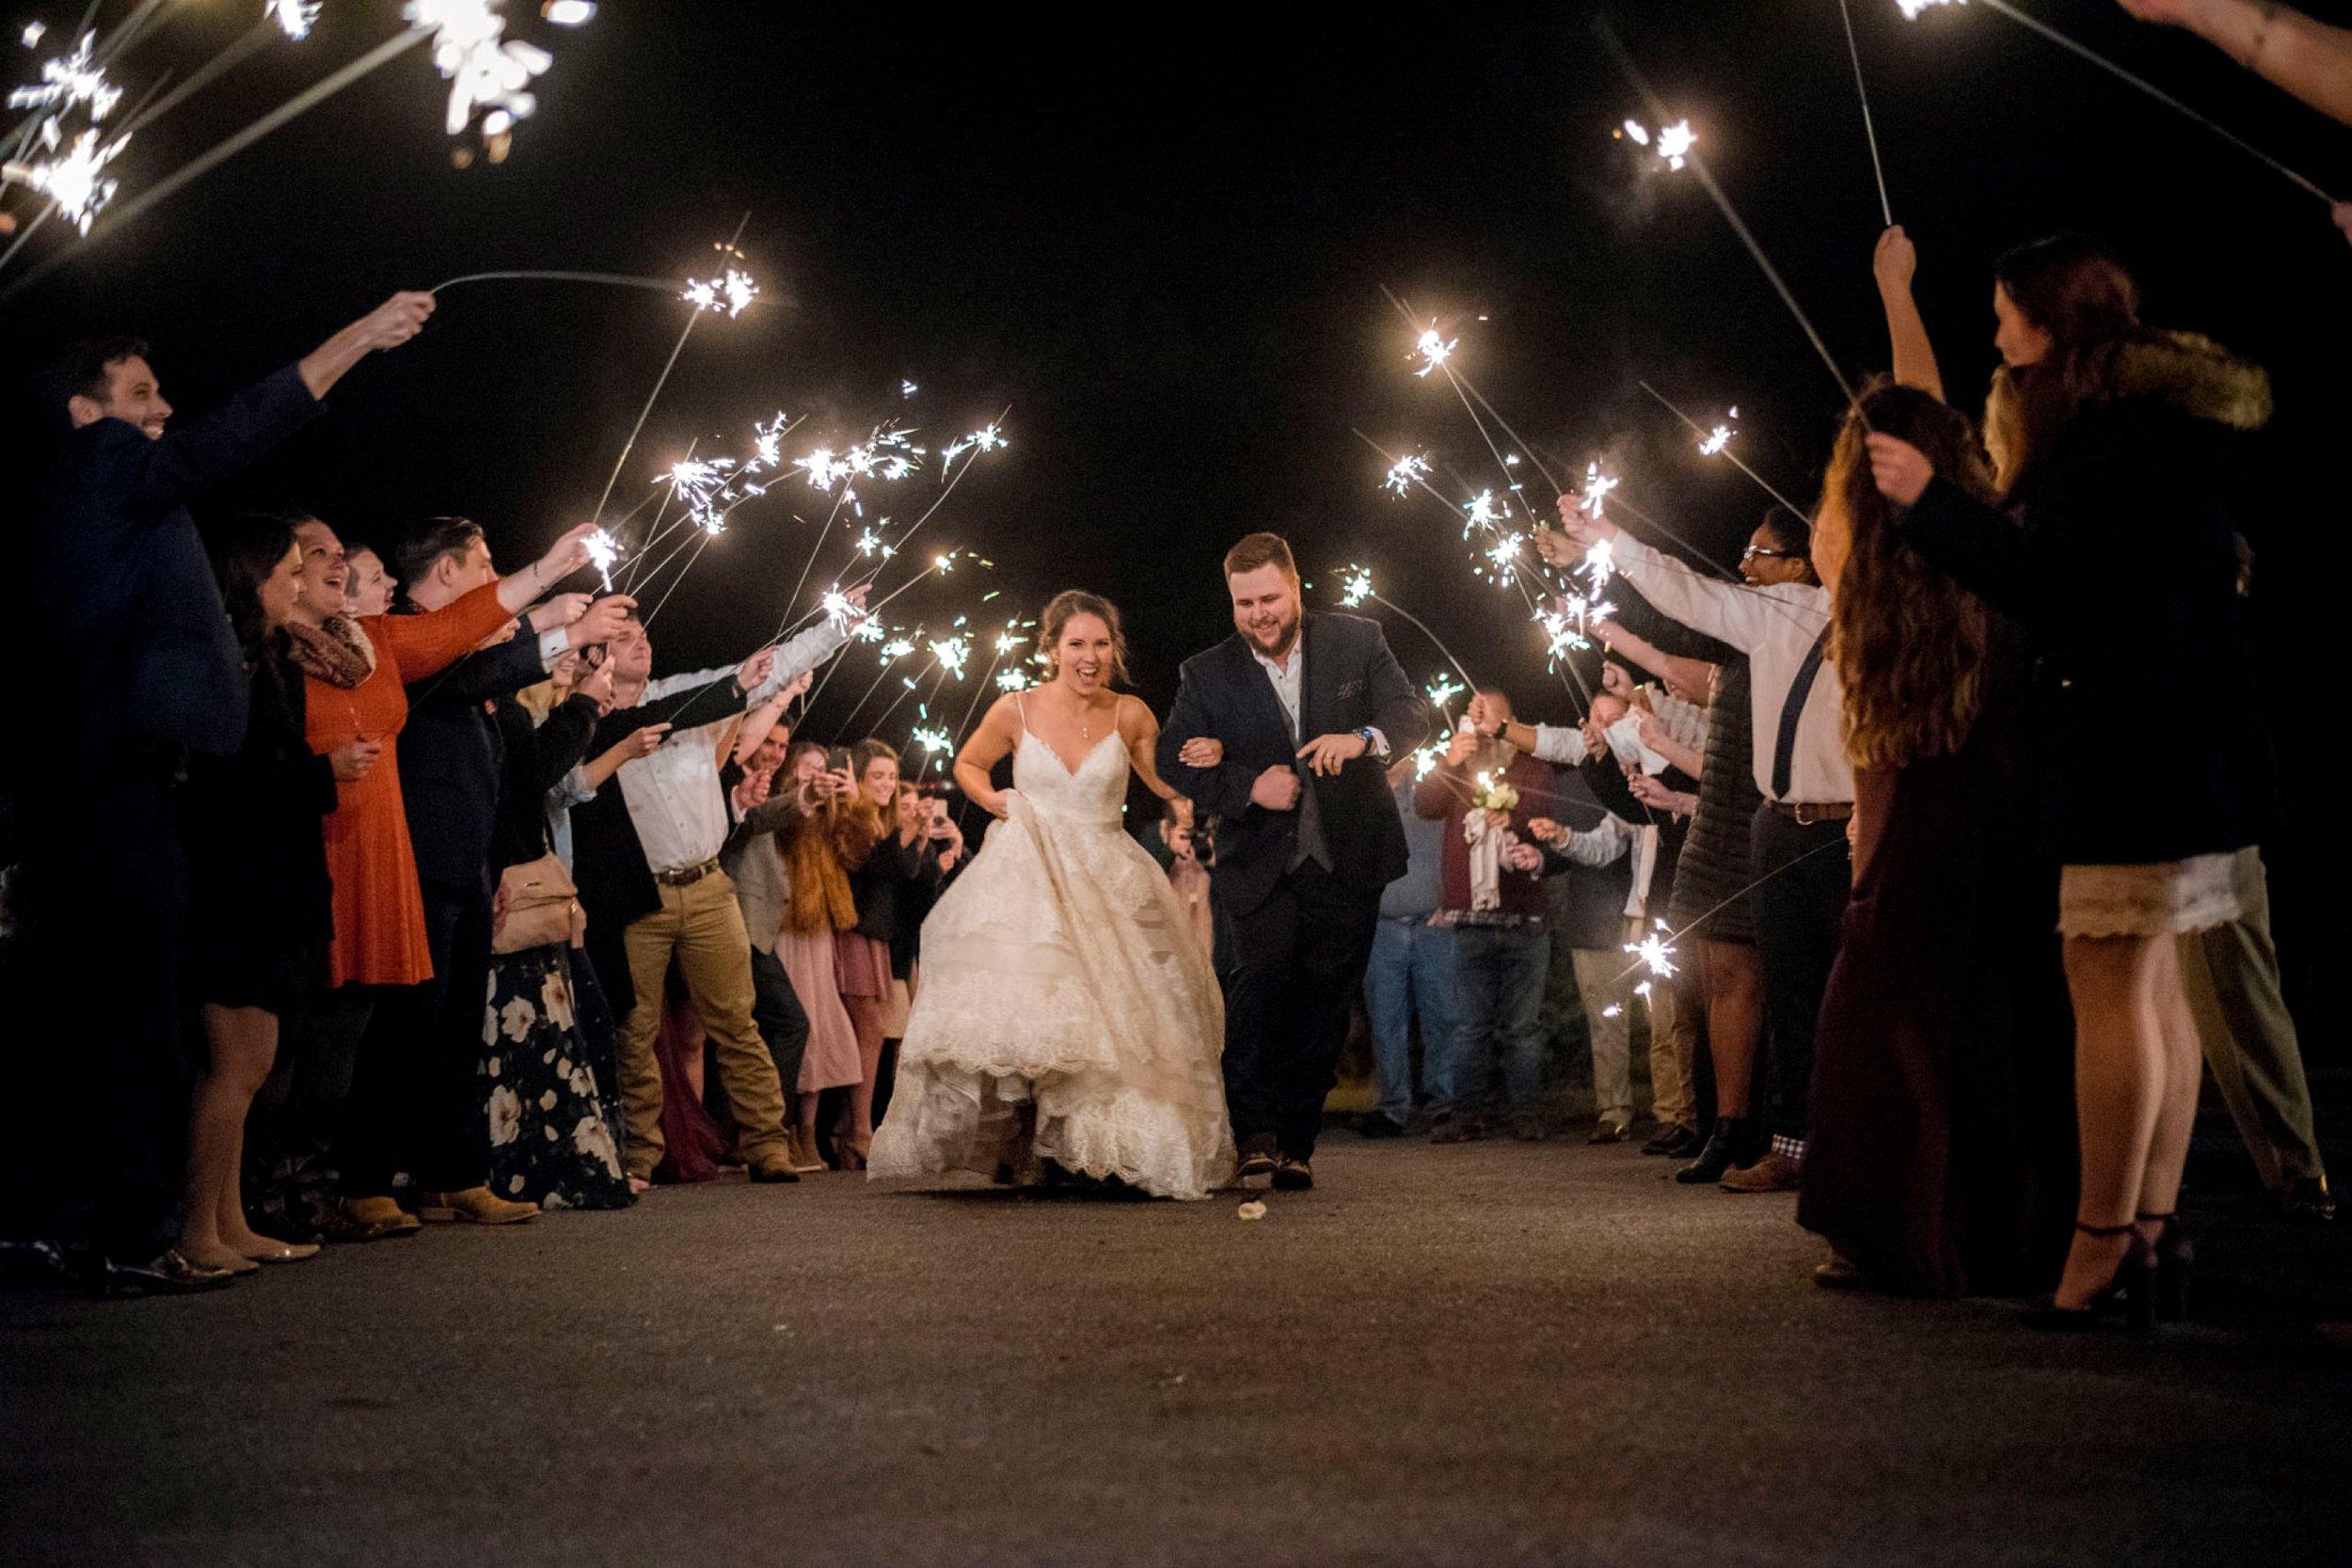 IrvineEstate_LexingtonVA_Wedding_FallWedding_VirginiaWeddingPhotographer 110.jpg